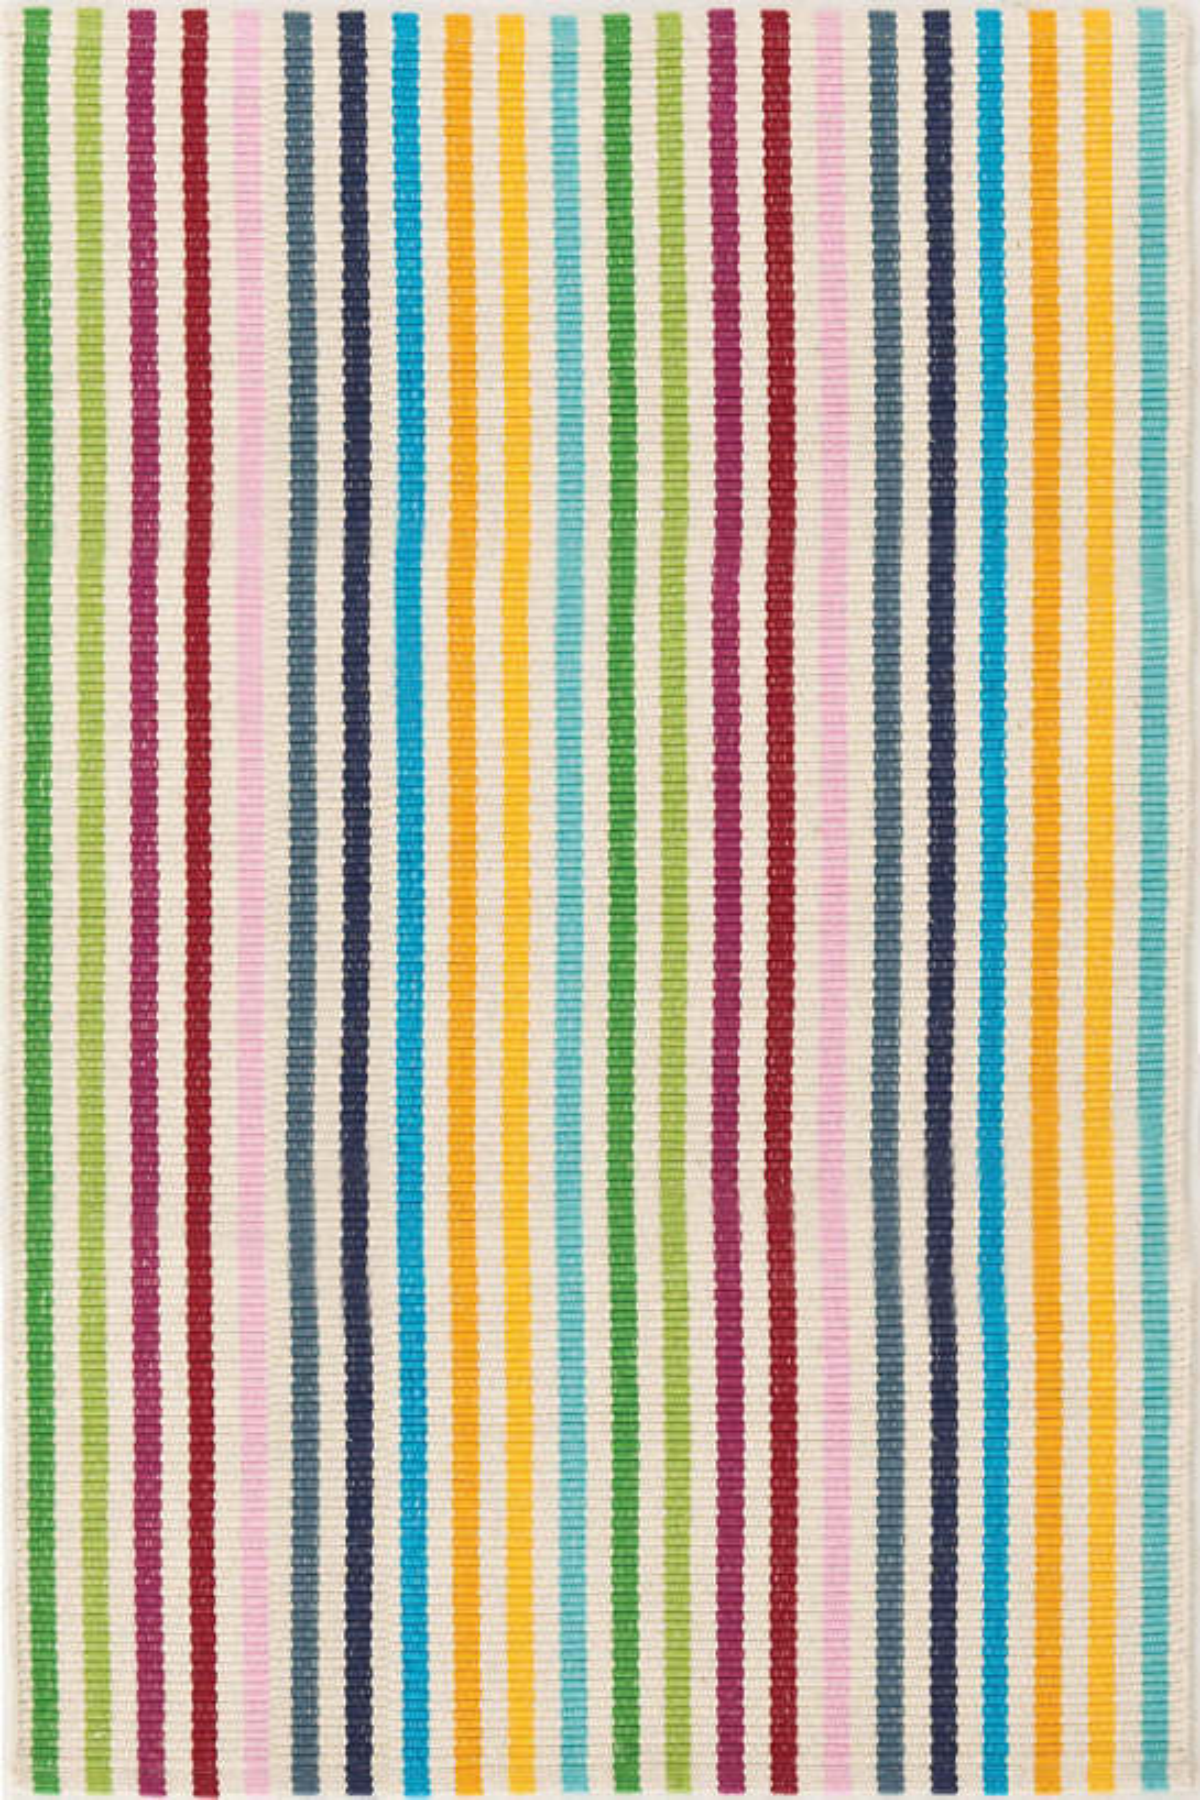 Rainbow Stripe Woven Cotton Rug